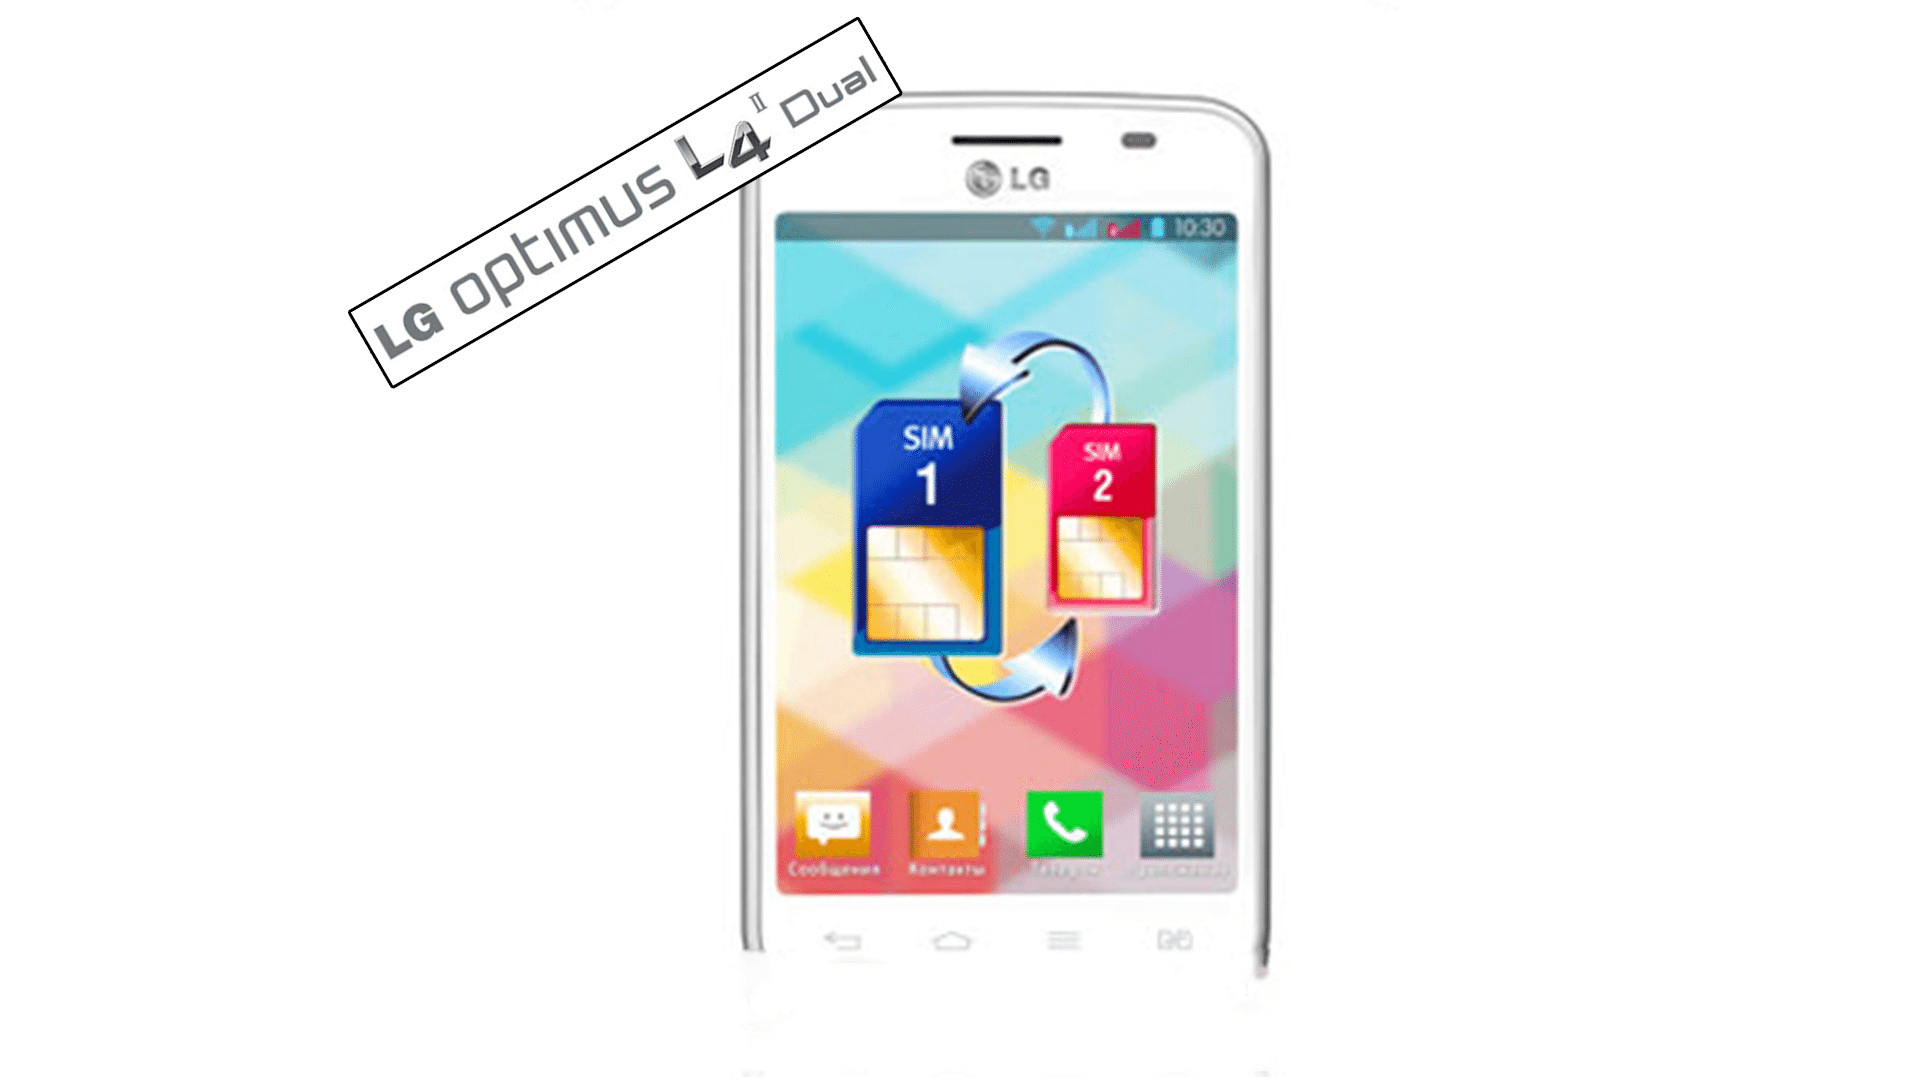 LG-Optimus-L4-II-Dual-Images